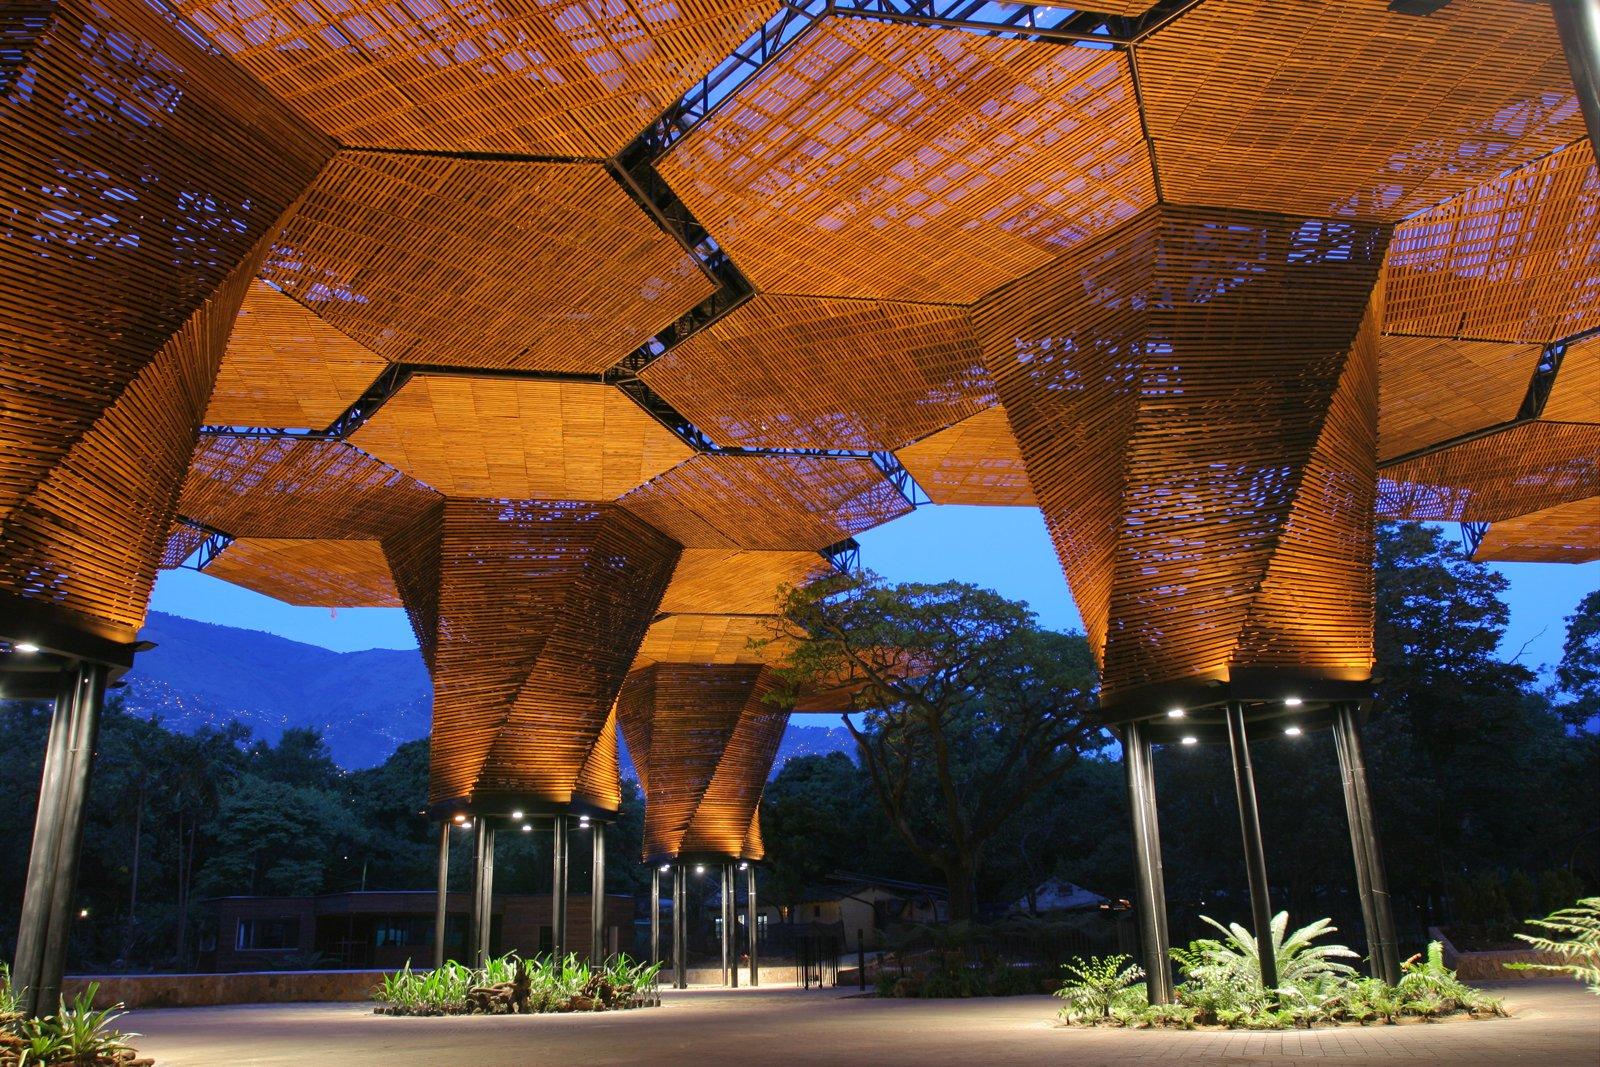 Medellín, Colombia, Jardin Botanico-Orquideorama (Botanical Garden). Alejandro Bernal (Colombian, b. 1973), Felipe Mesa (Colombian, b. 1975), Camilo Restrepo (Colombian, b. 1974), and J. Paul Restrepo (Colombian, b. 1944), PLAN B Architects. Colombia, 2004–7. Photo: Sergio Gómez  Why Design Now? by Miyoko Ohtake